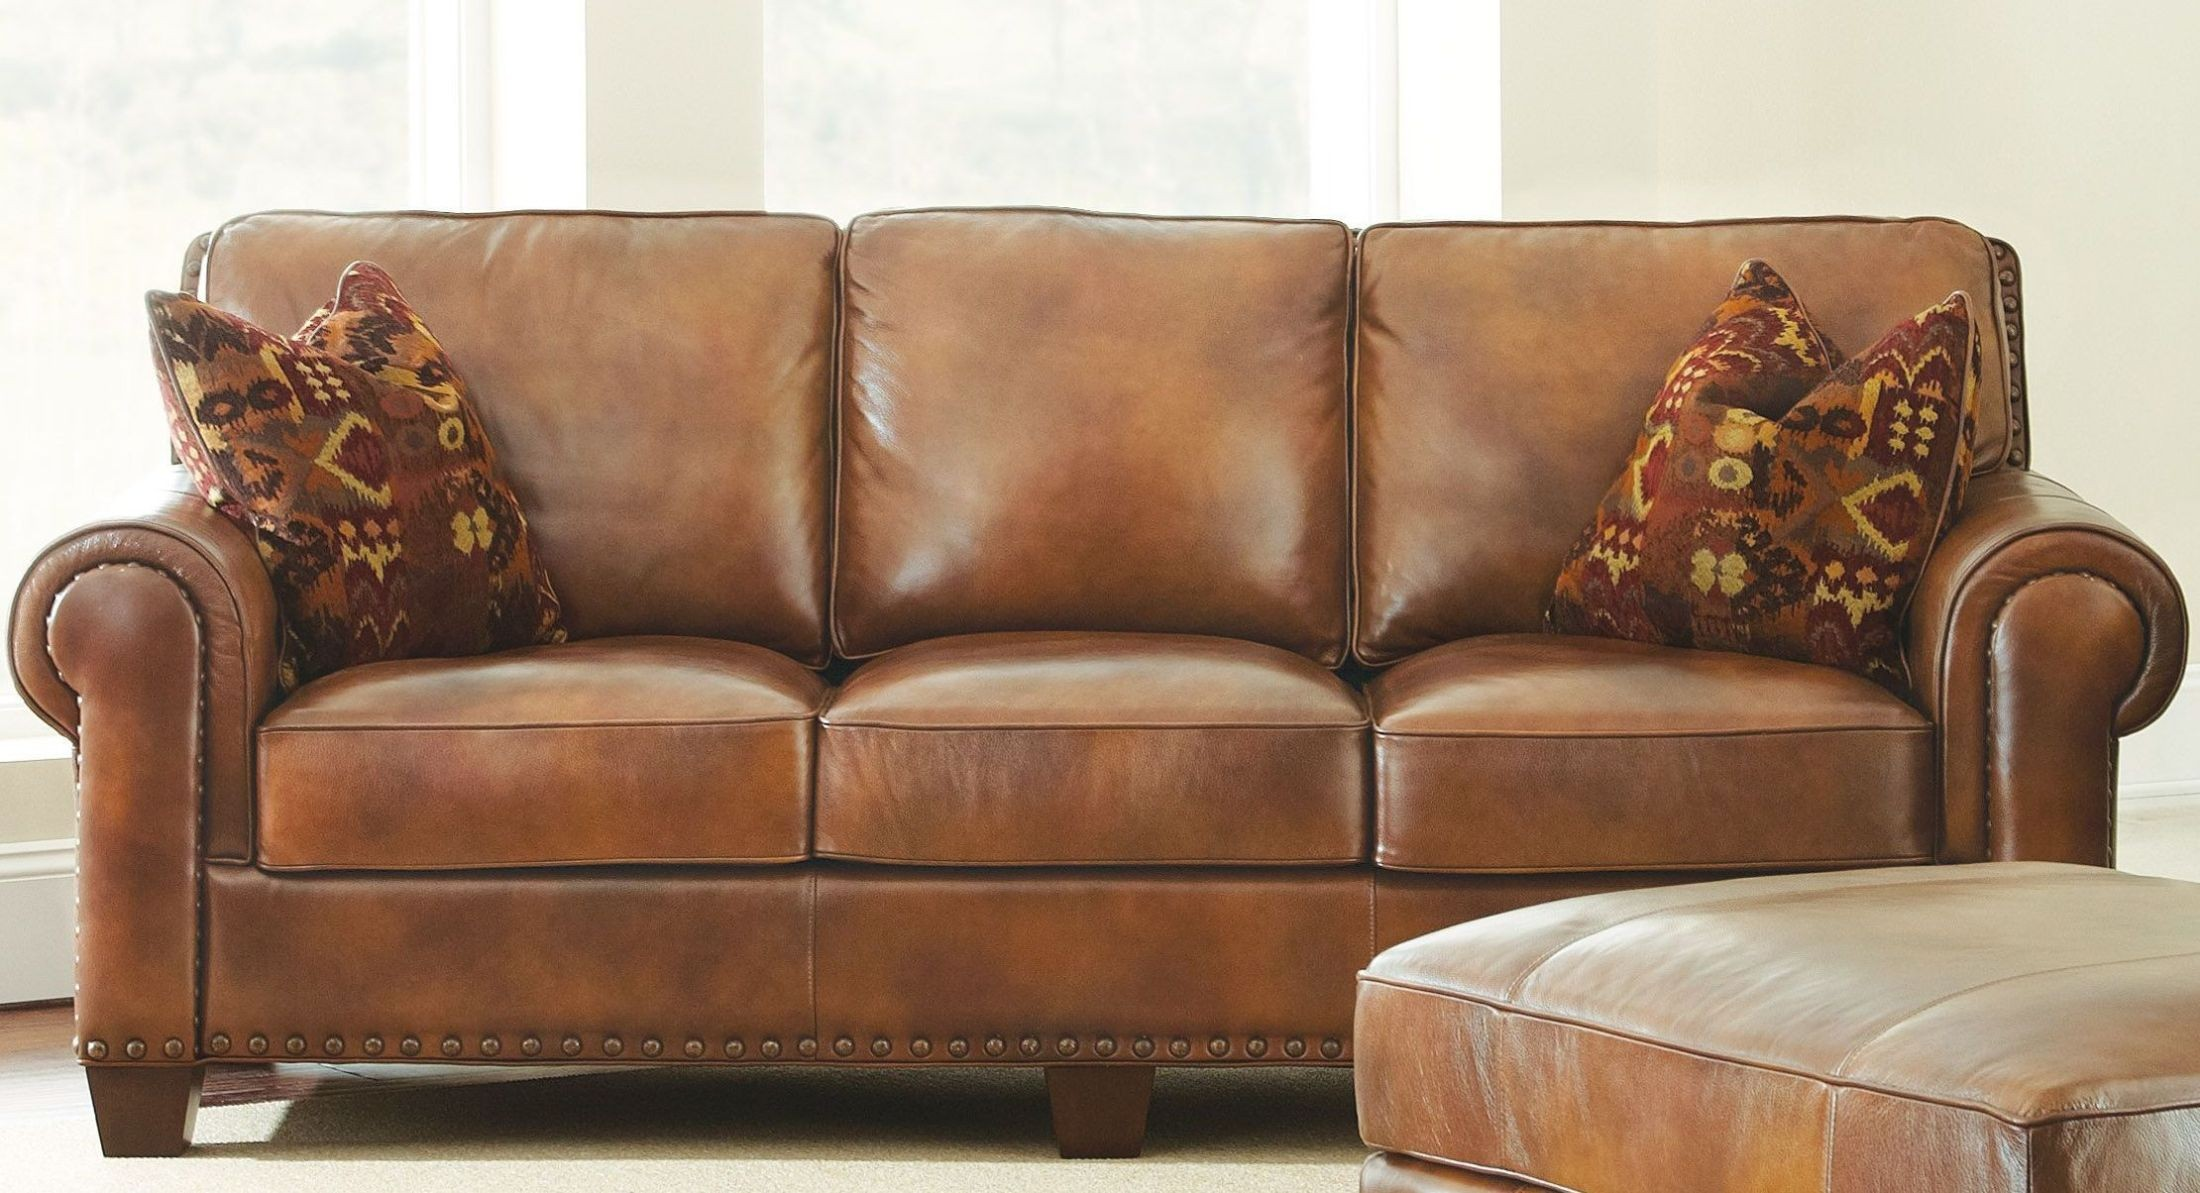 Silverado Caramel Brown Sofa from Steve